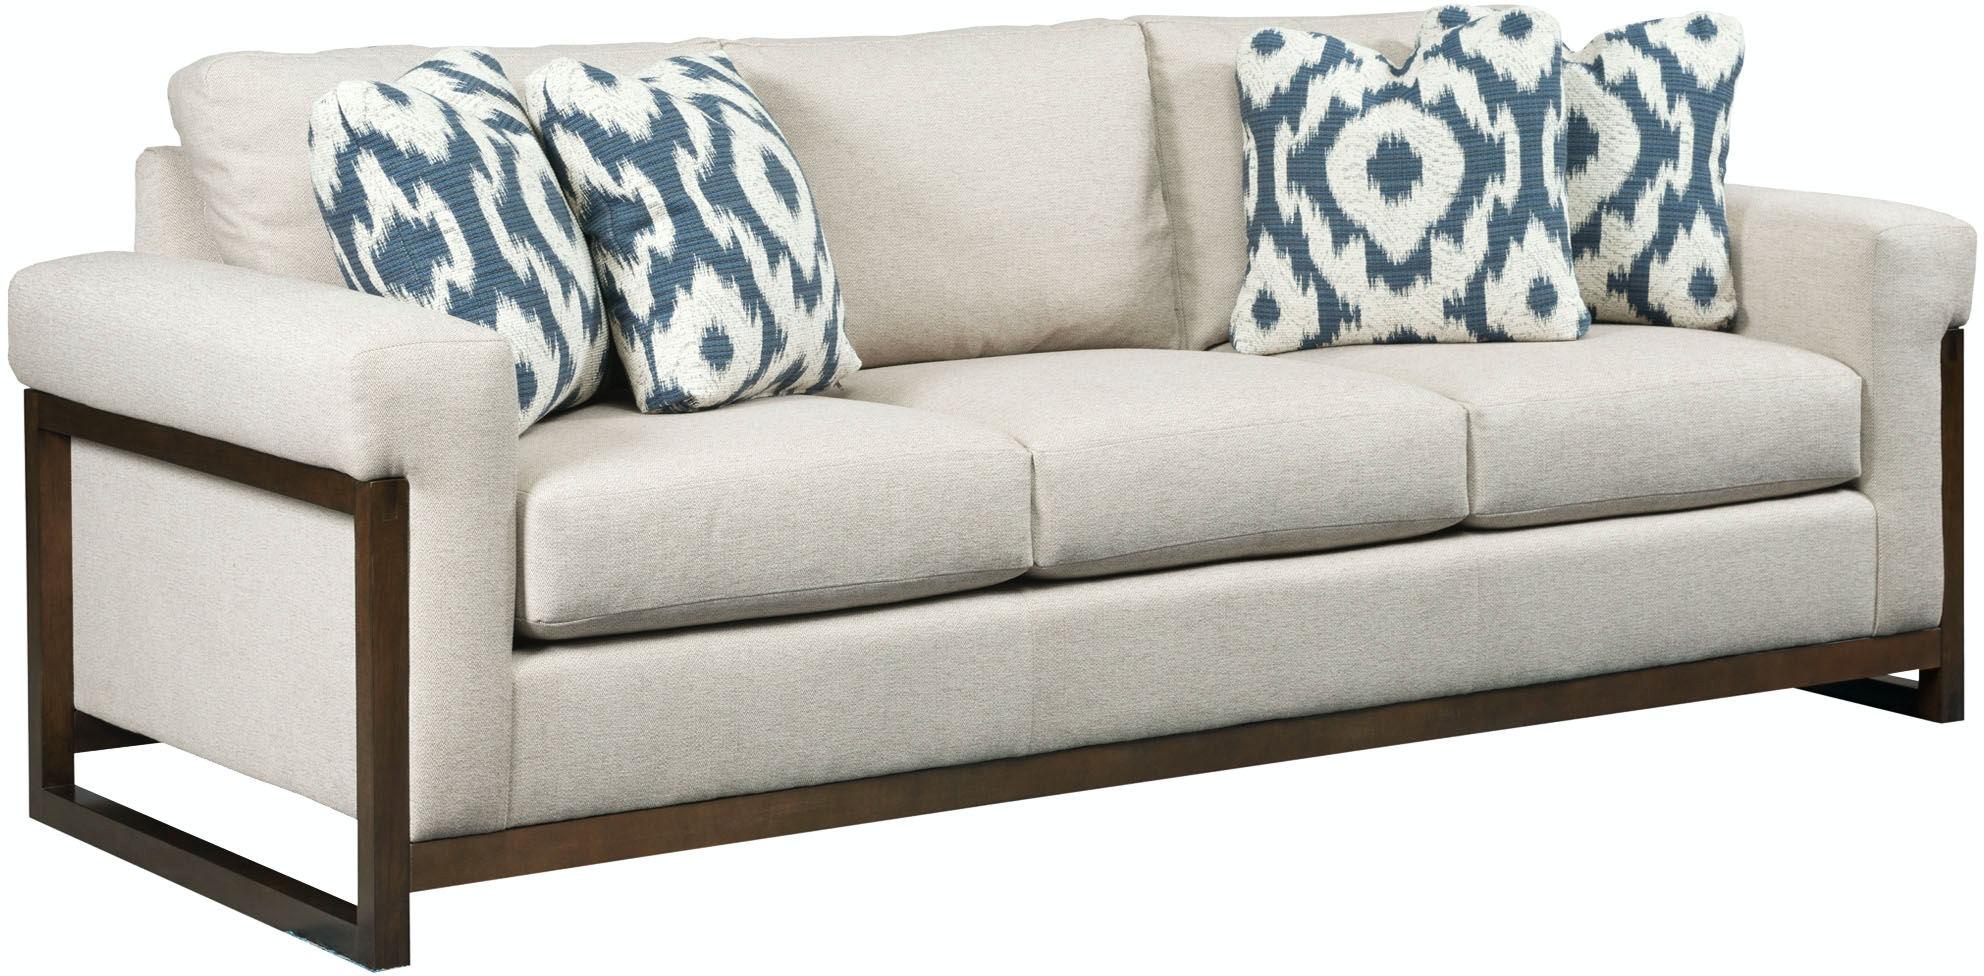 Kincaid Furniture Living Room Sofa 301 87 Ennis Fine